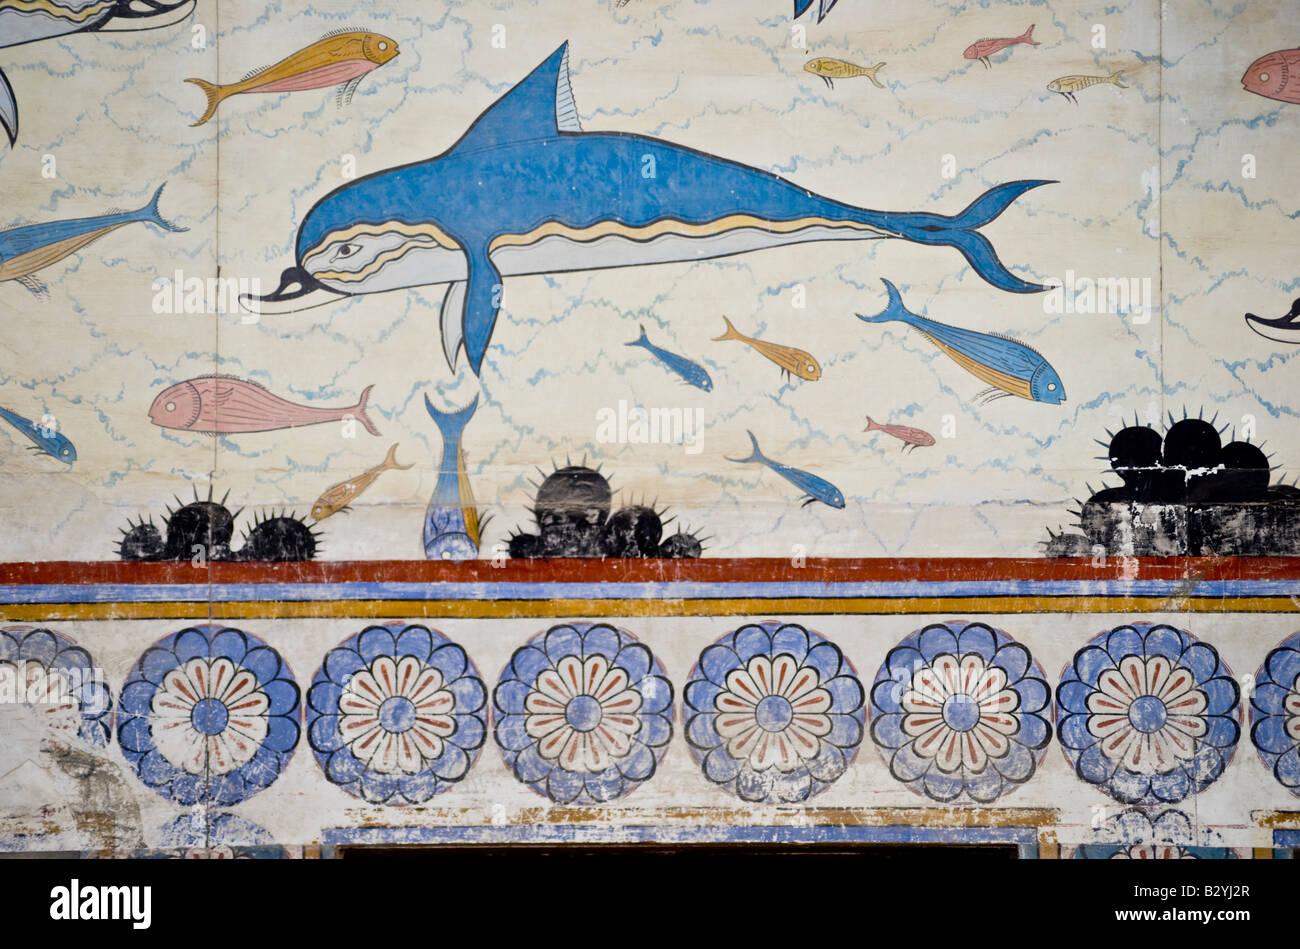 Minoan frescoes knossos images for Dolphin mural knossos